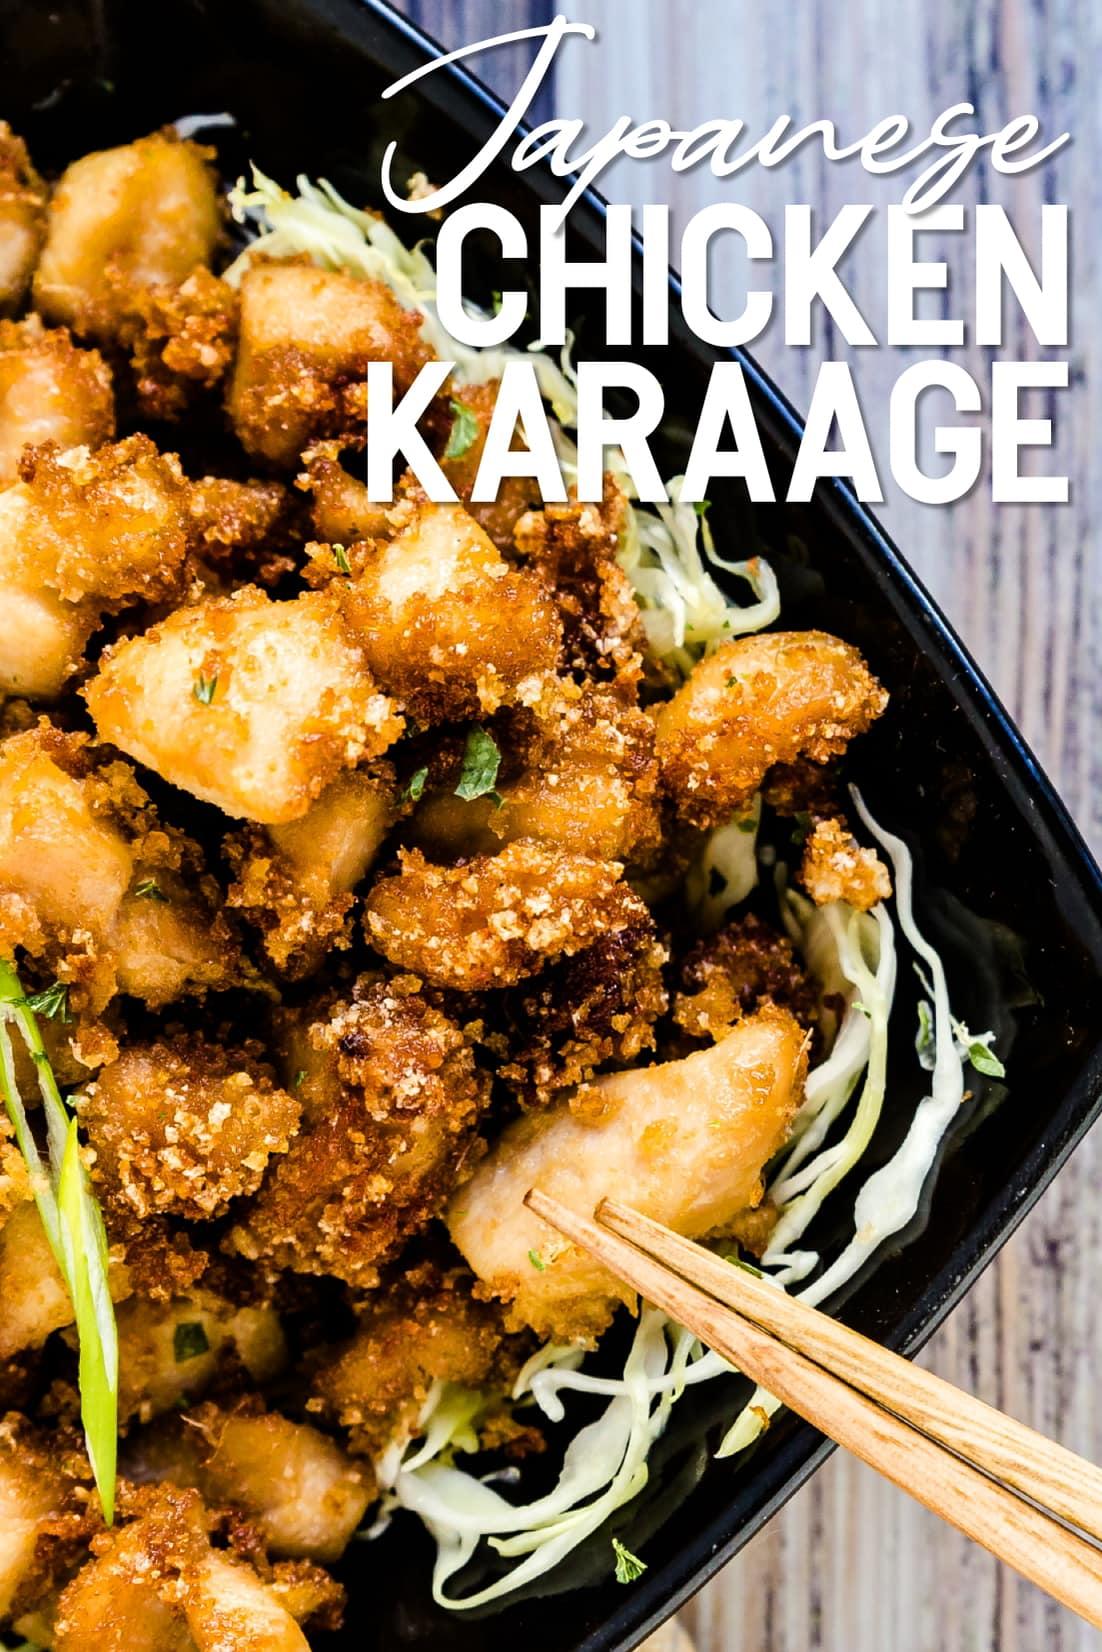 Japanese style chicken karaage with chopsticks